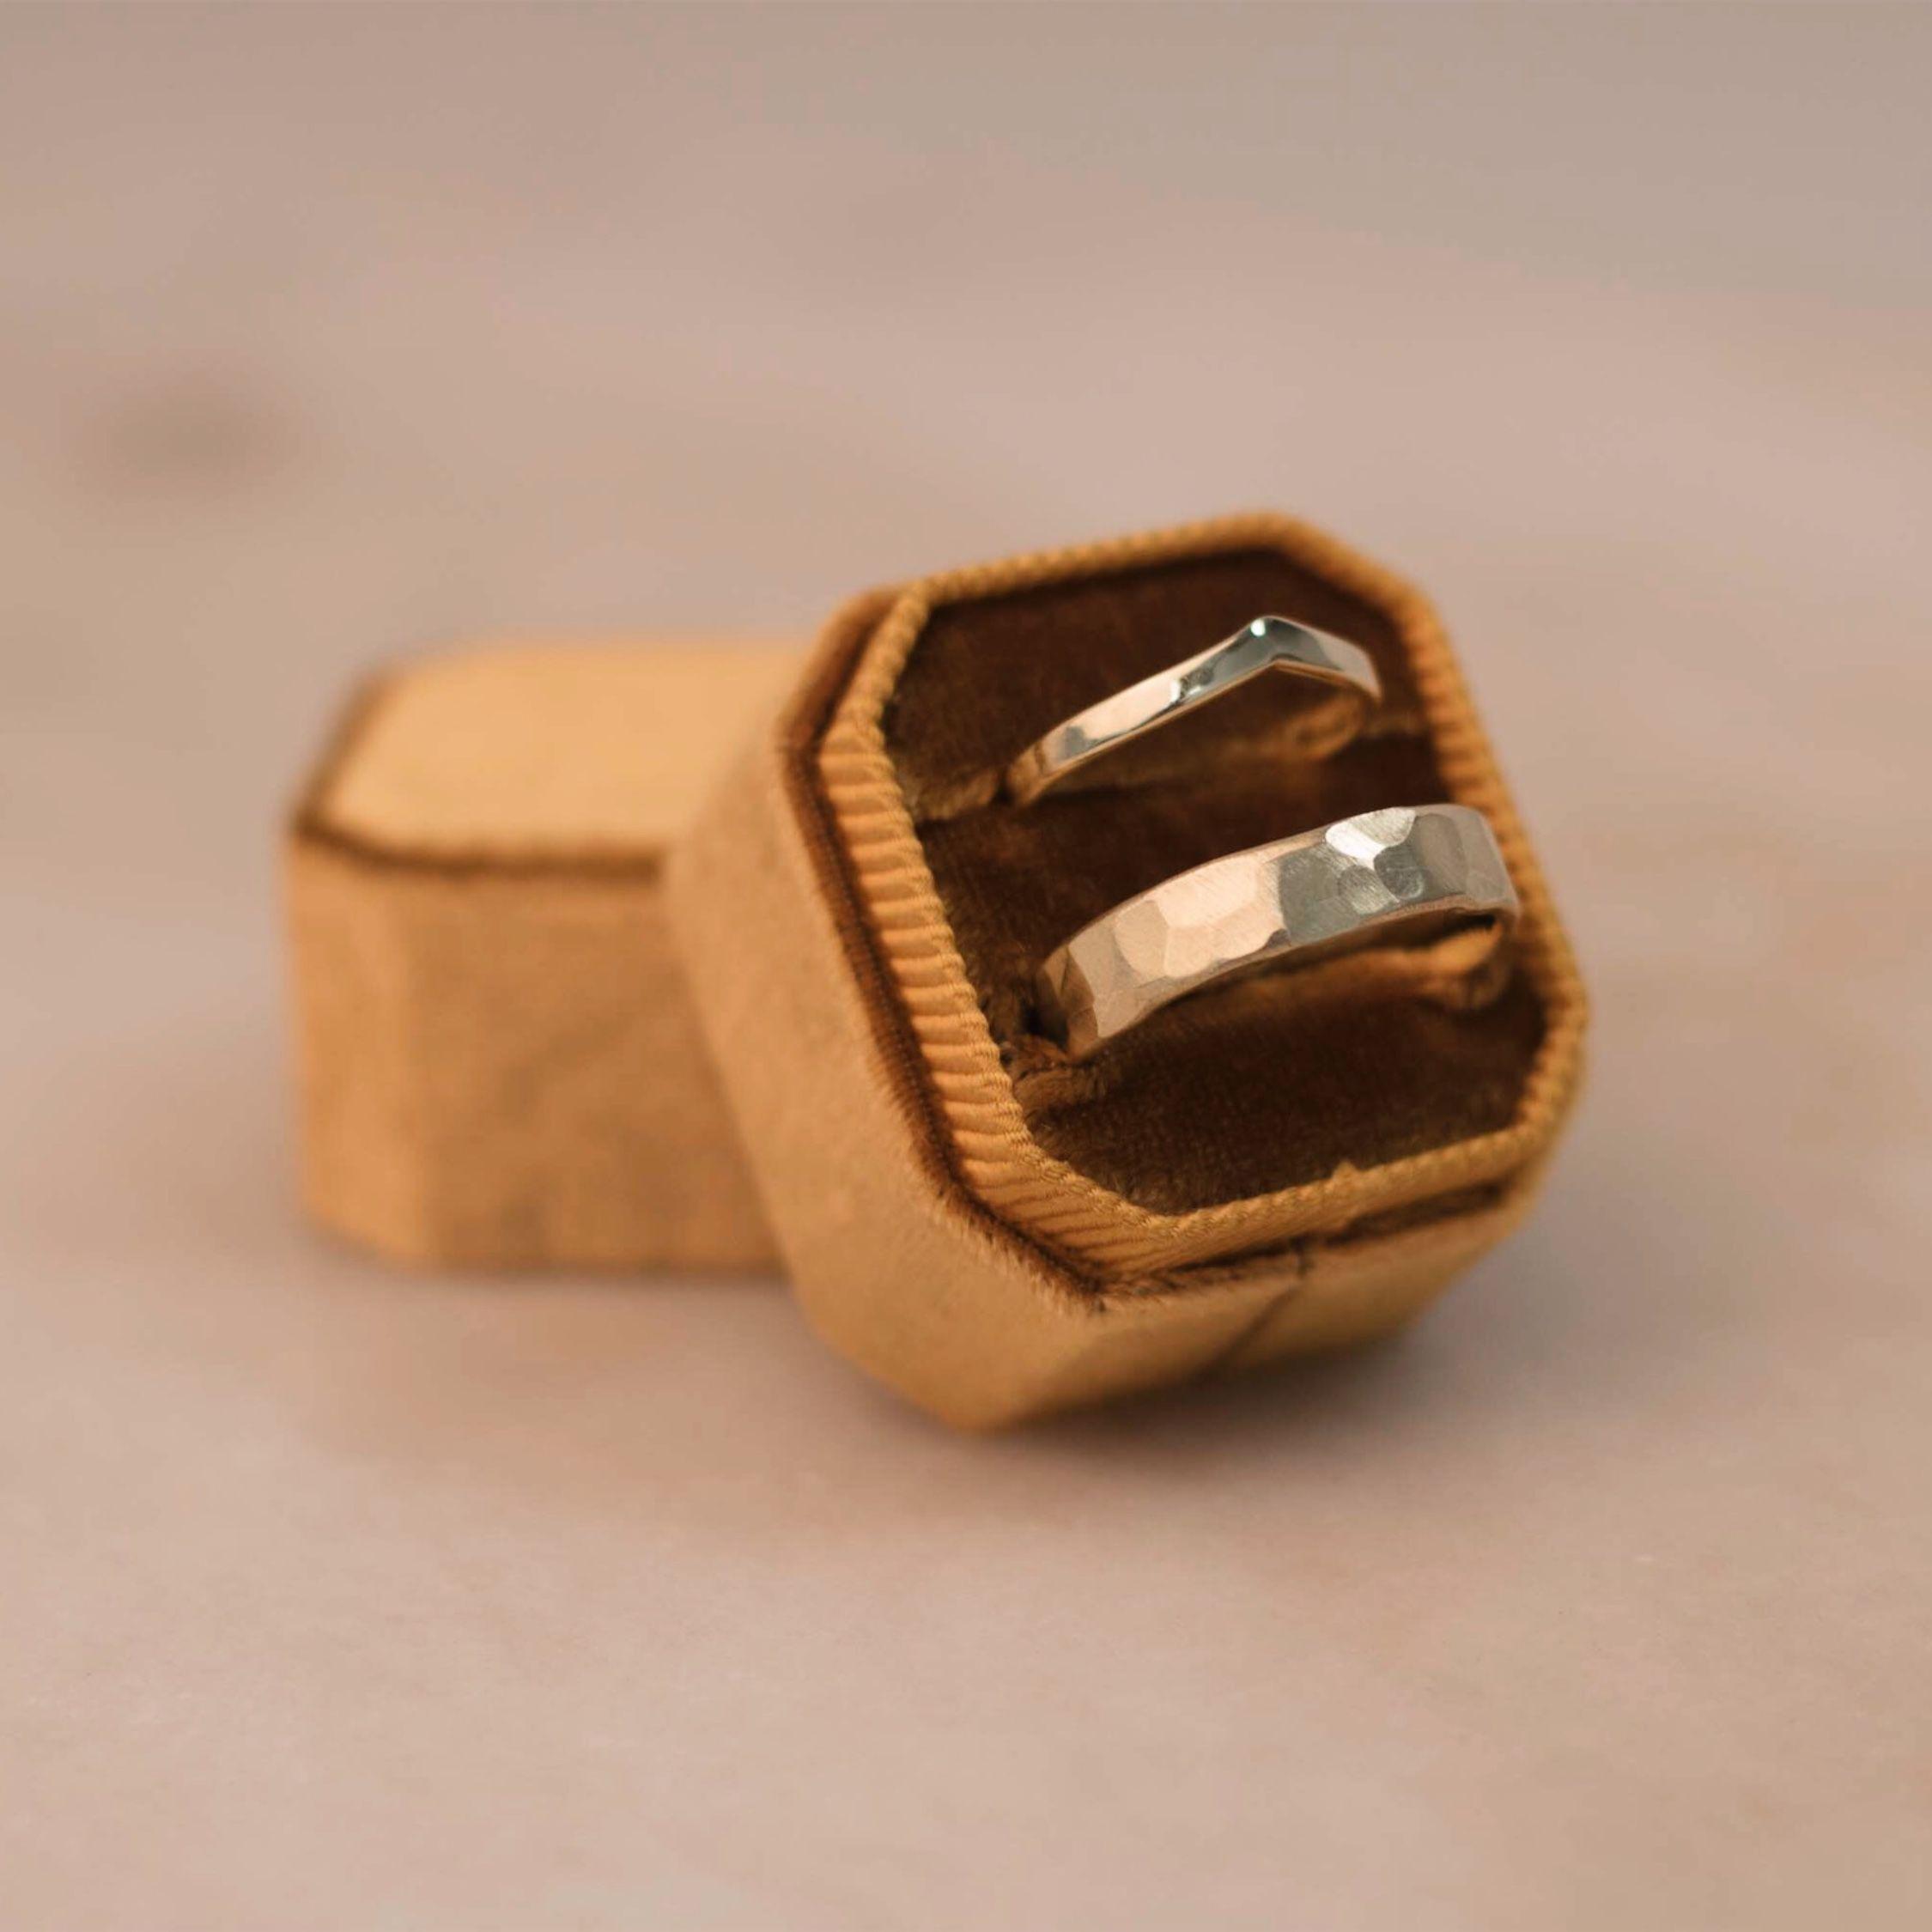 14k Yellow Gold Arrow Women's Weddingband (2 x 1.2 mm) in Shiny Finish // 14k Yellow Gold Straight Men's Weddingband (5 x 1.5 mm), Hammered in a Satin Matte Finish